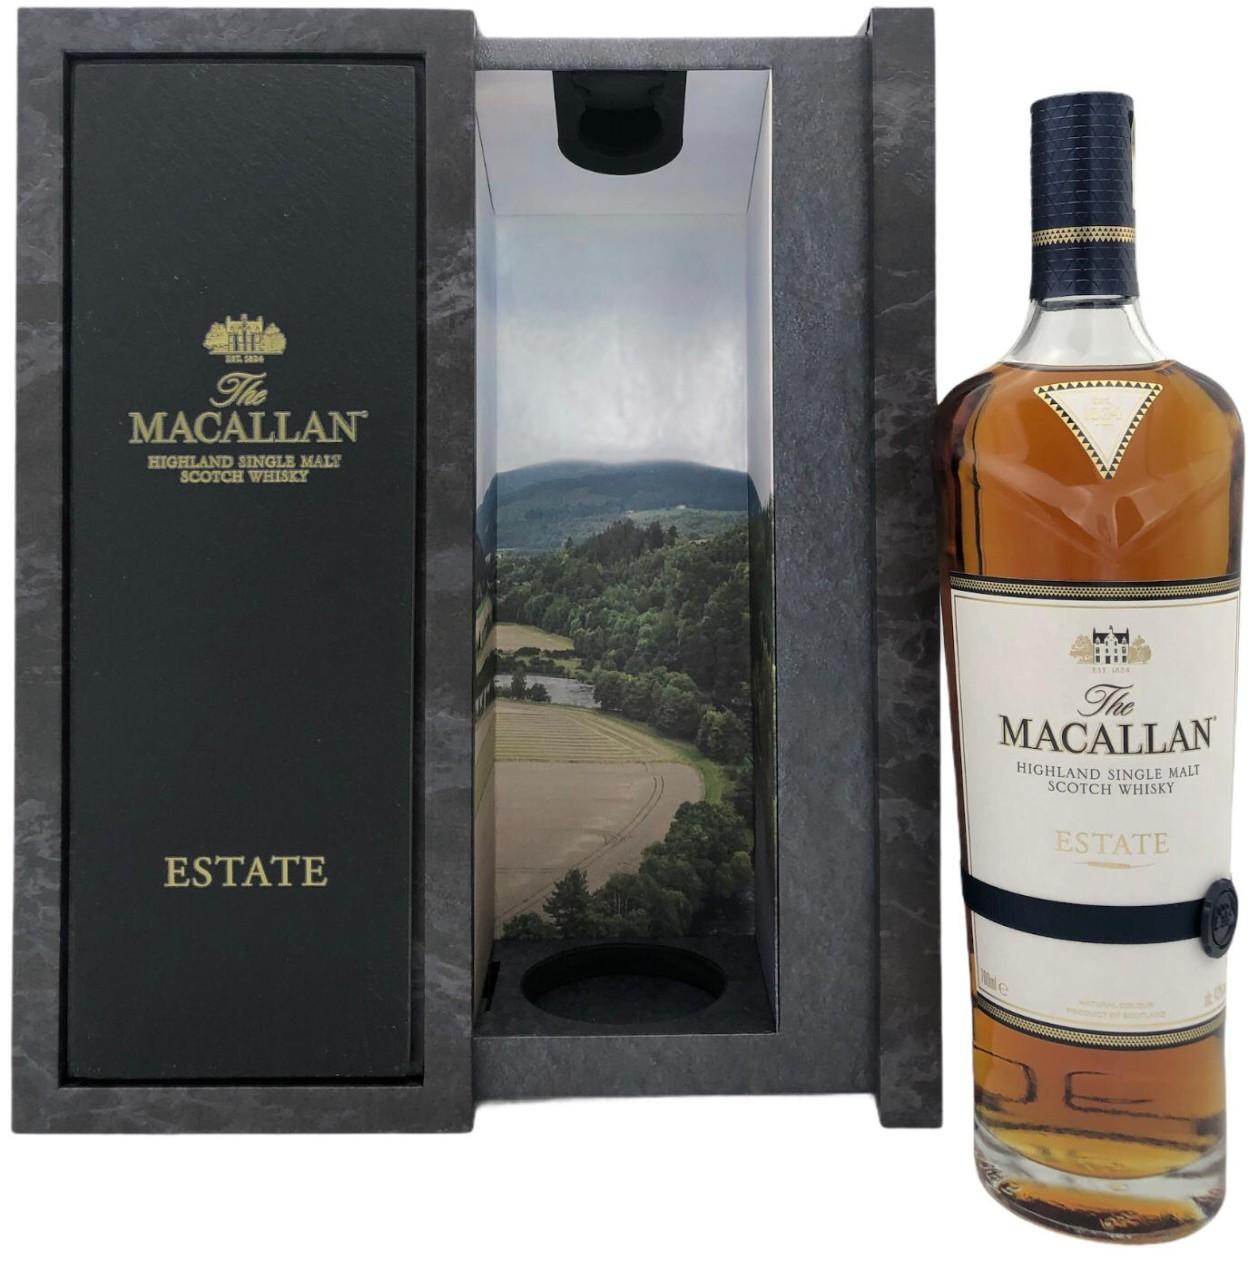 The Macallan Estate Highland Single Malt in GP Limitierung 0,7l